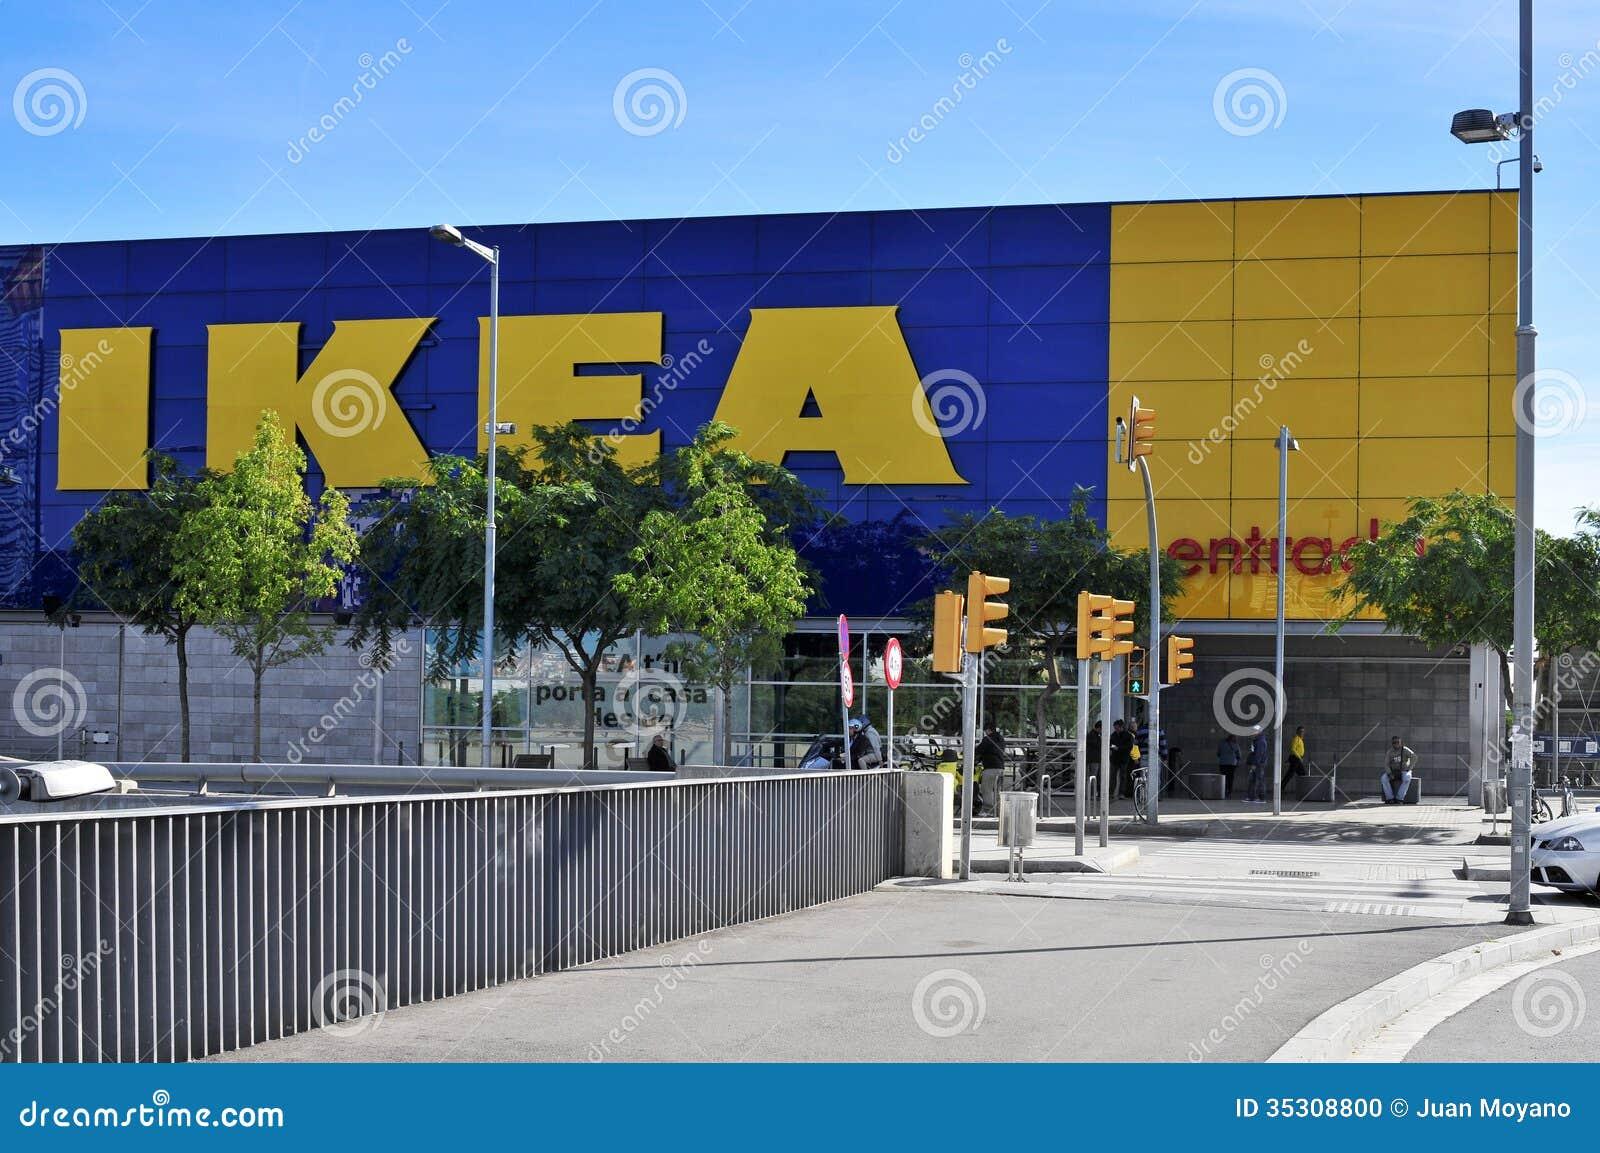 Ikea store in hospitalet de llobregat spain editorial - Muebles en hospitalet de llobregat ...